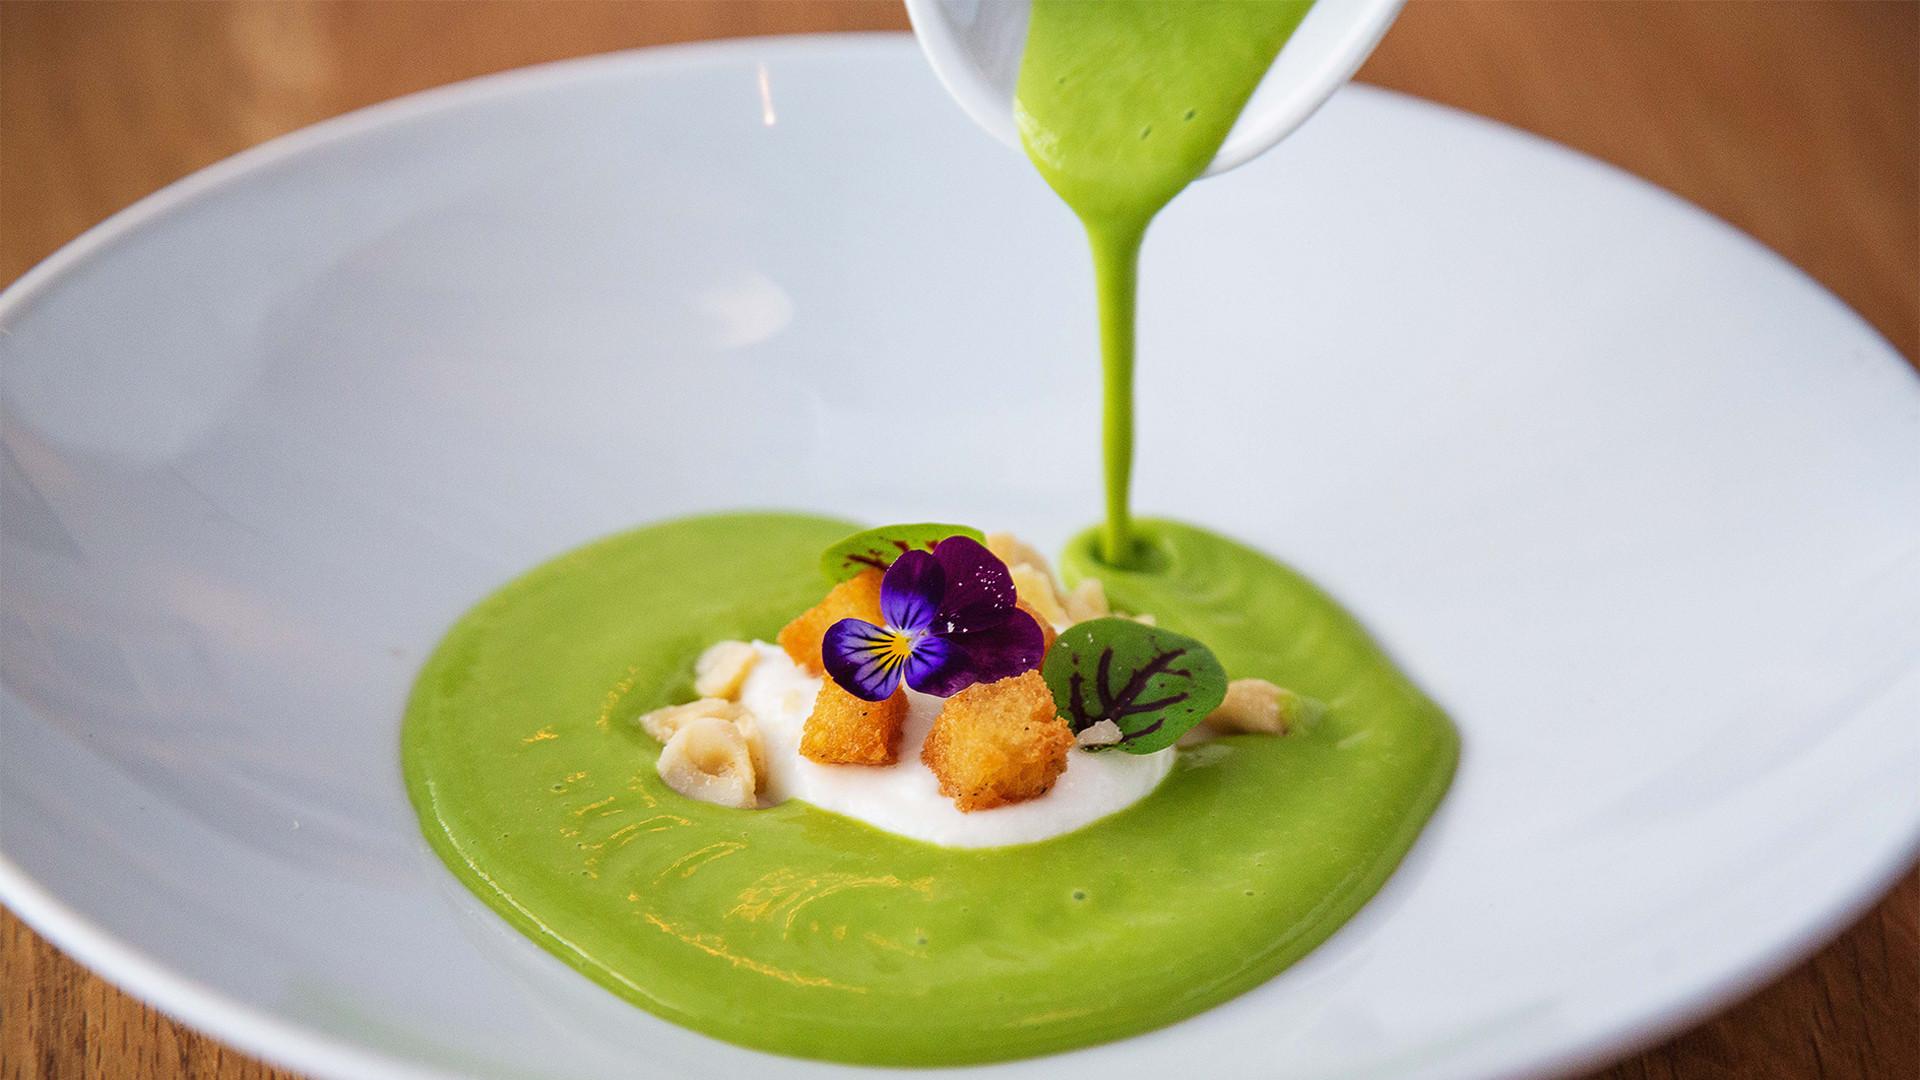 Best farm-to-table restaurants Toronto | Seasonal dish at Richmond Station